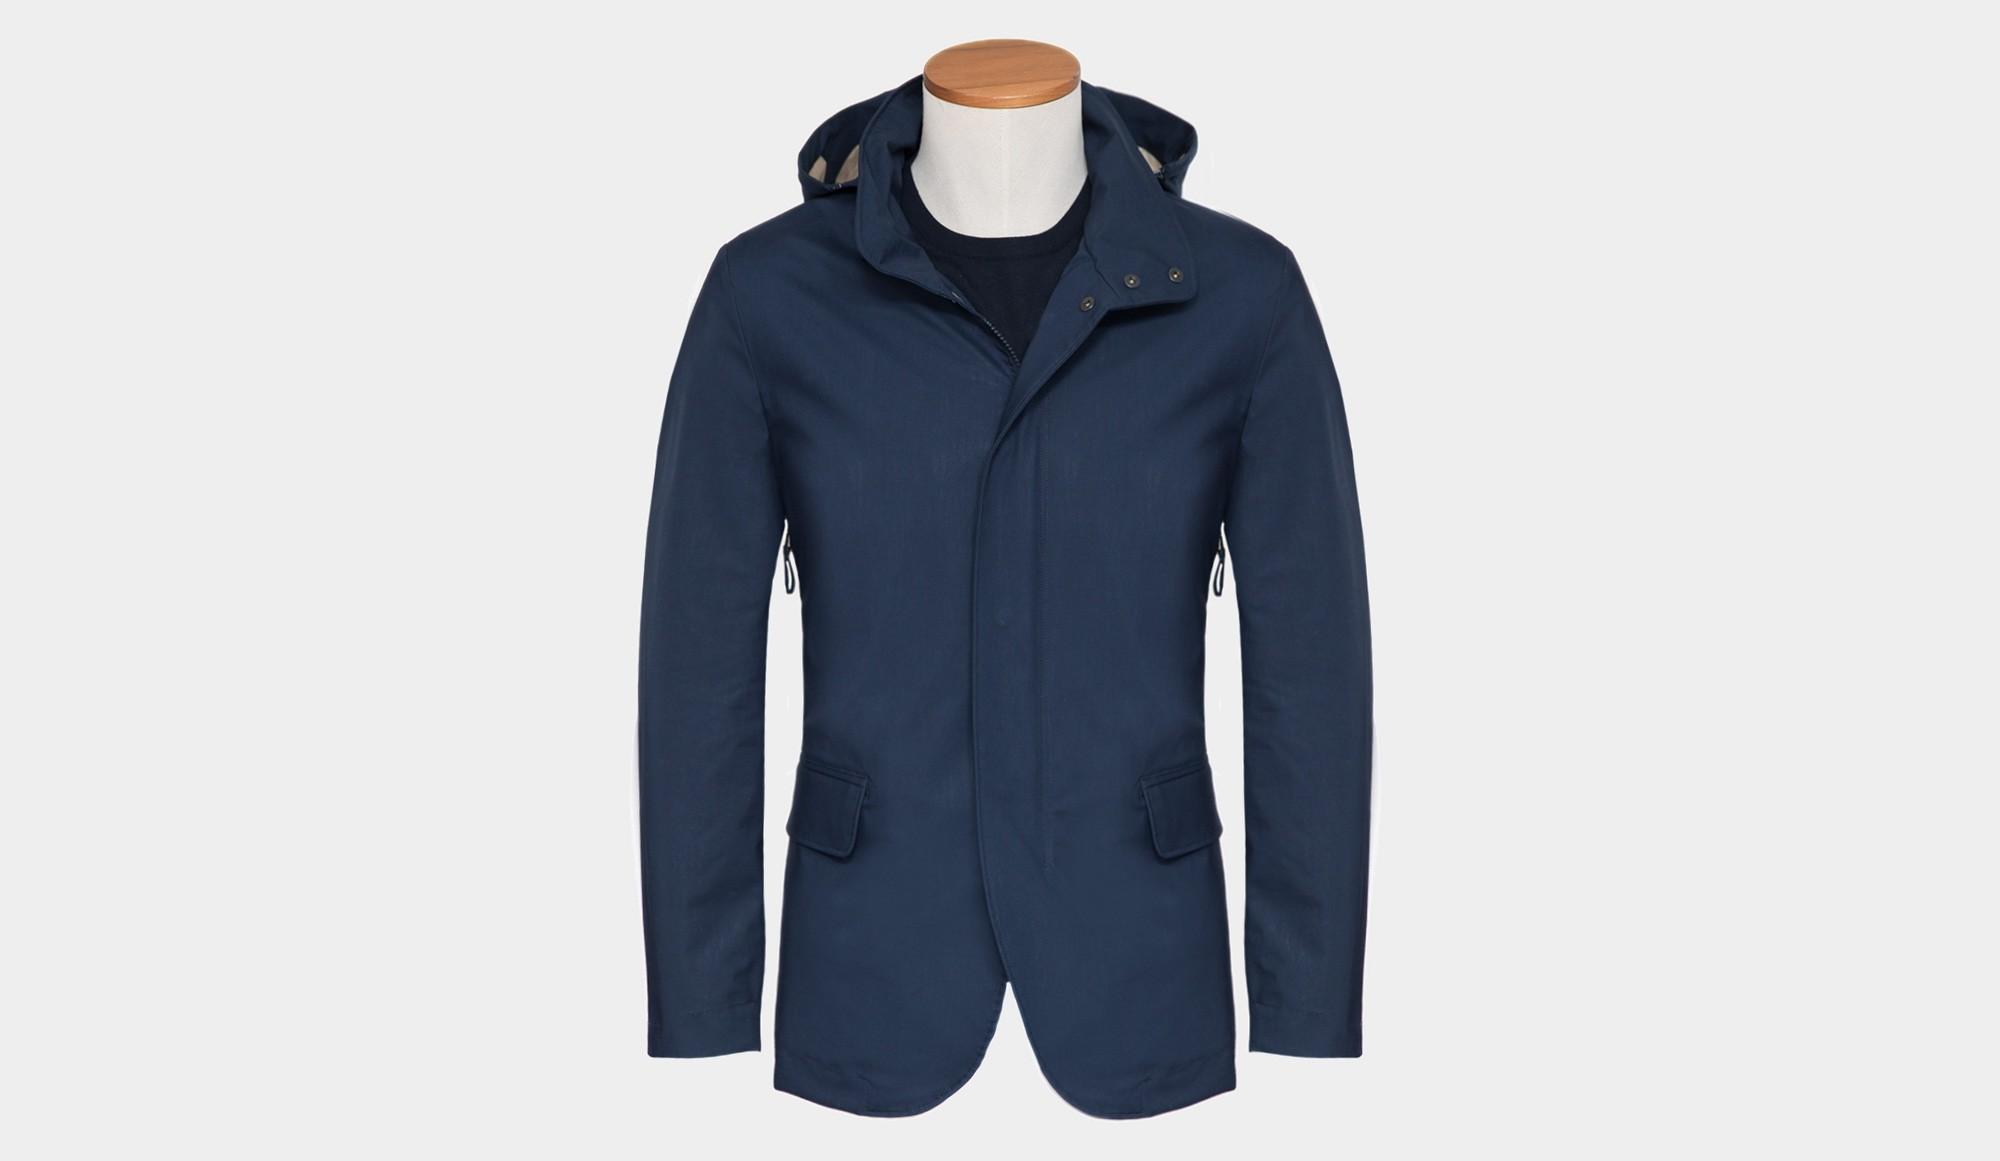 online retailer 6ccd0 00d44 Aspesi Coat Blue - Cipriani